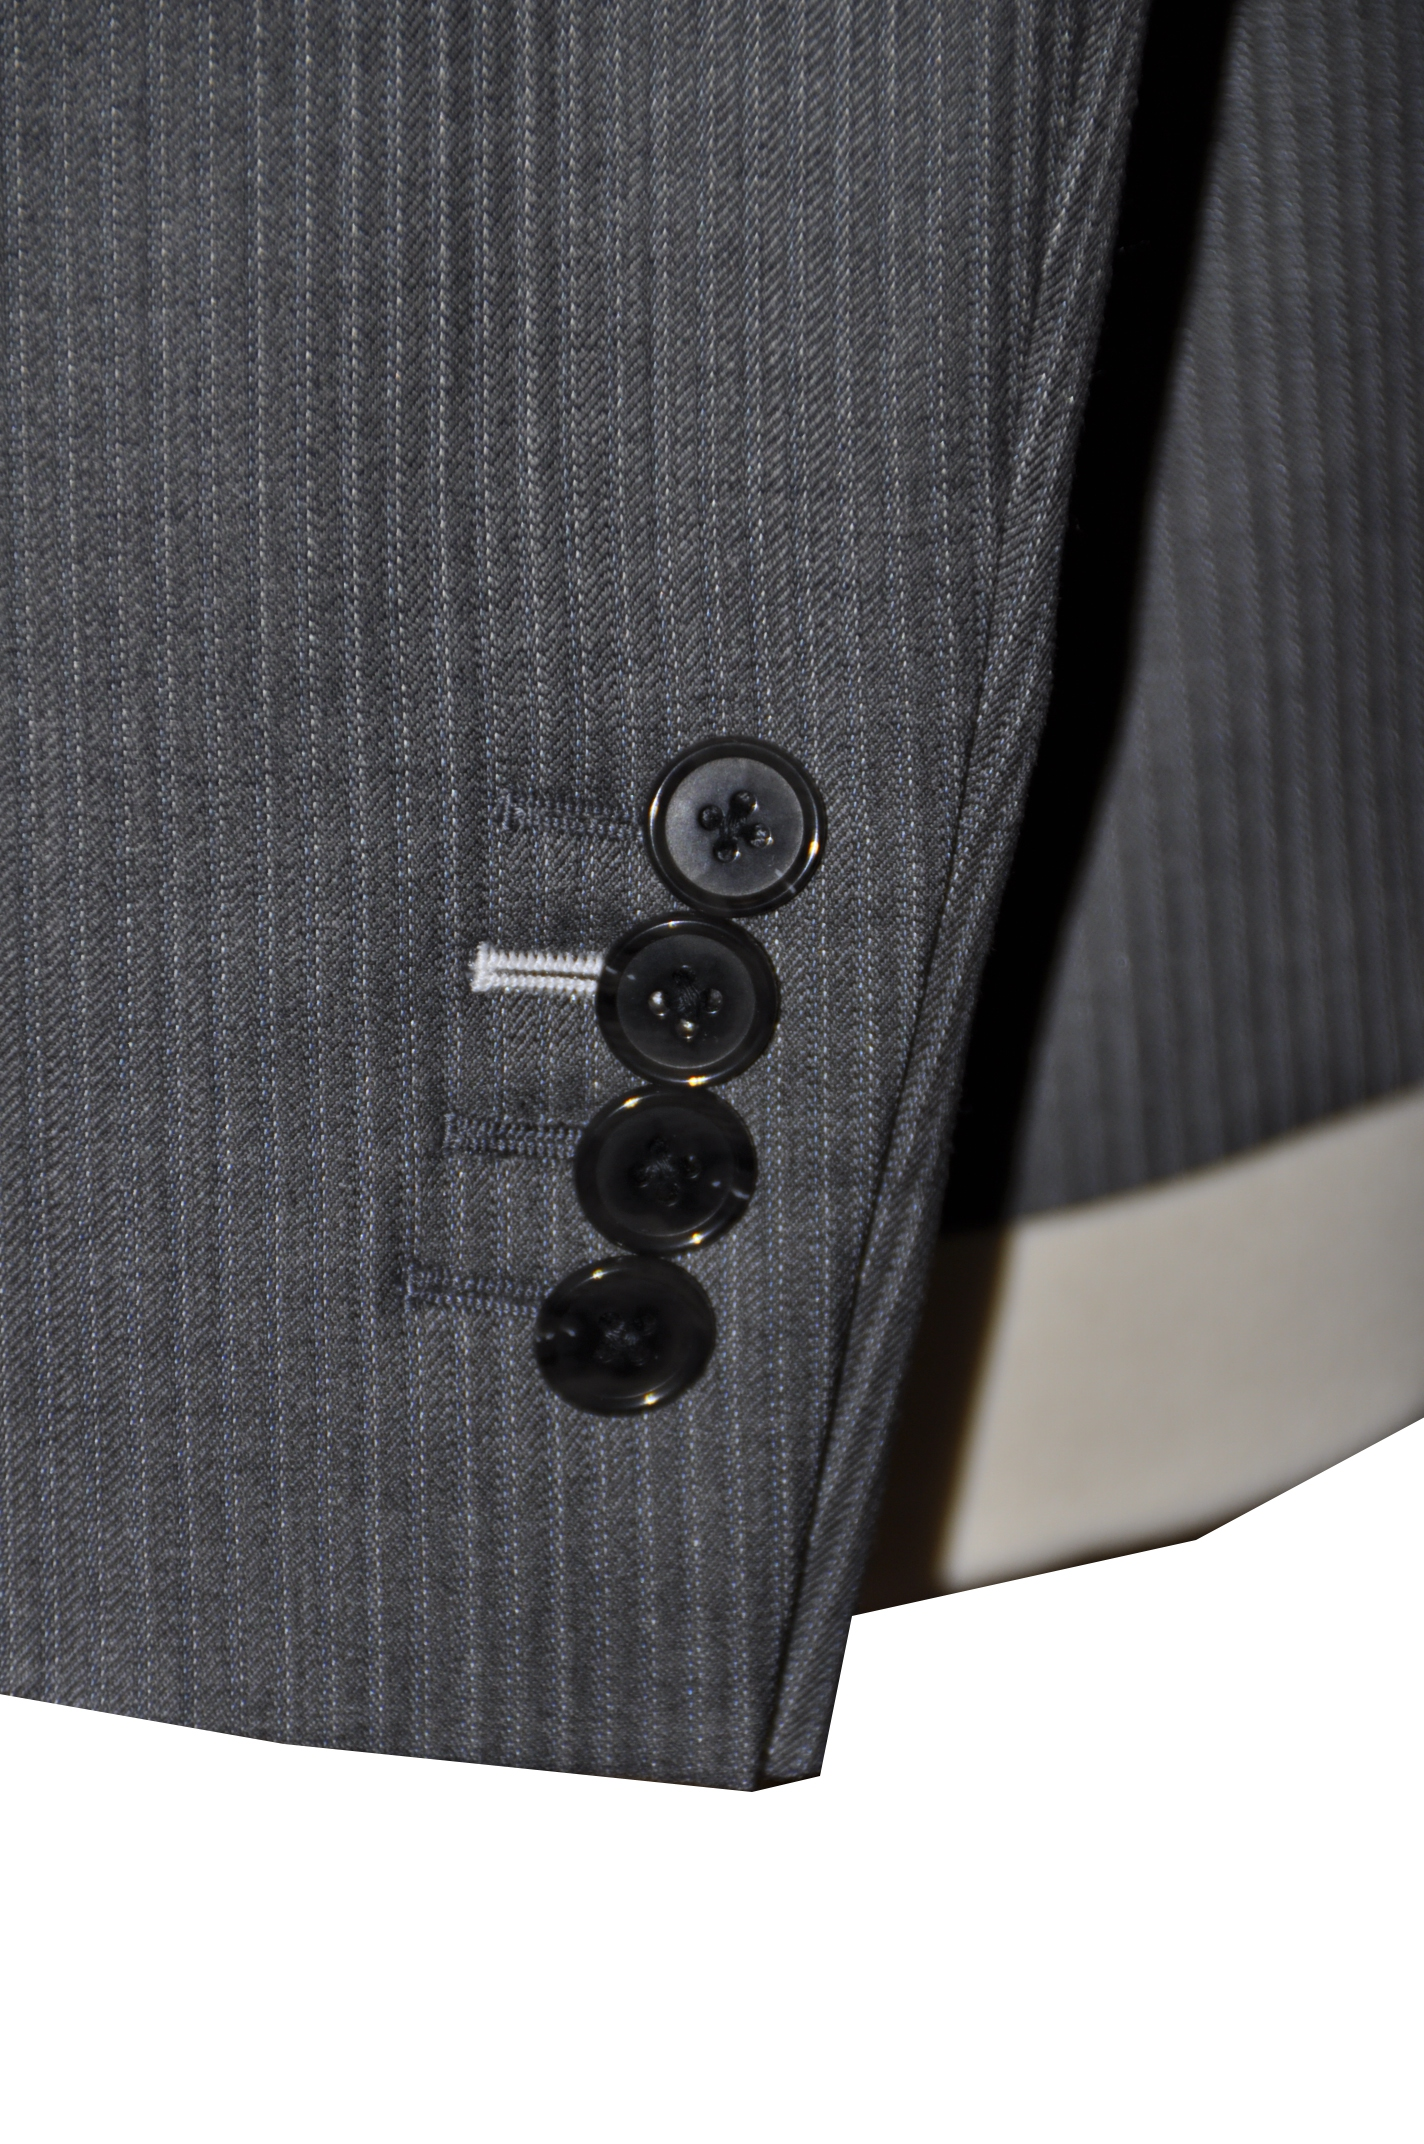 D1 ボタンホール糸色変更 名古屋の完全予約制オーダースーツ専門店DEFFERT